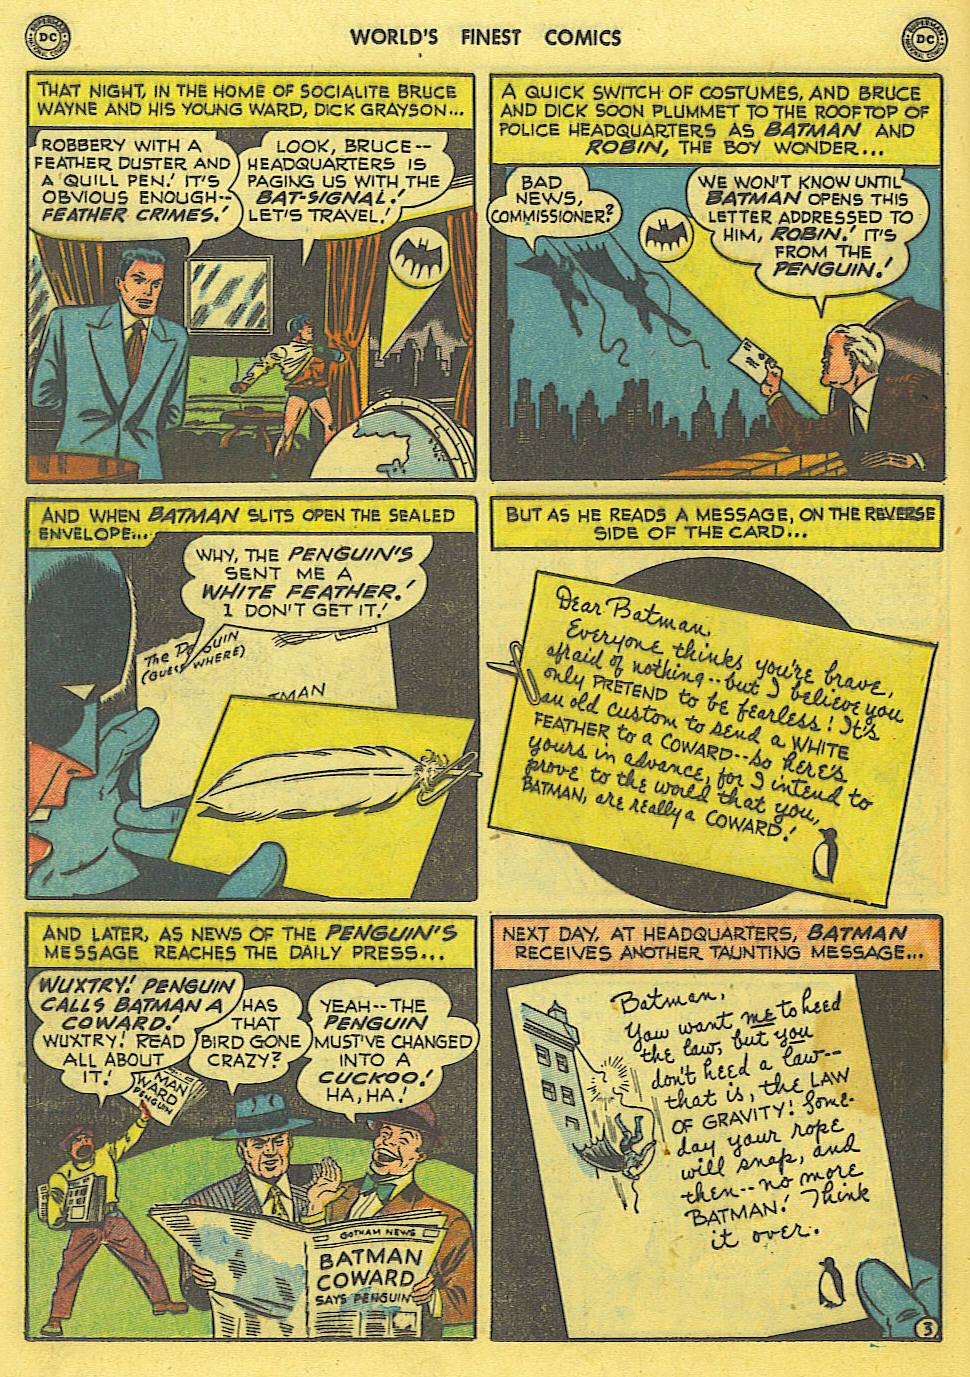 Read online World's Finest Comics comic -  Issue #49 - 65